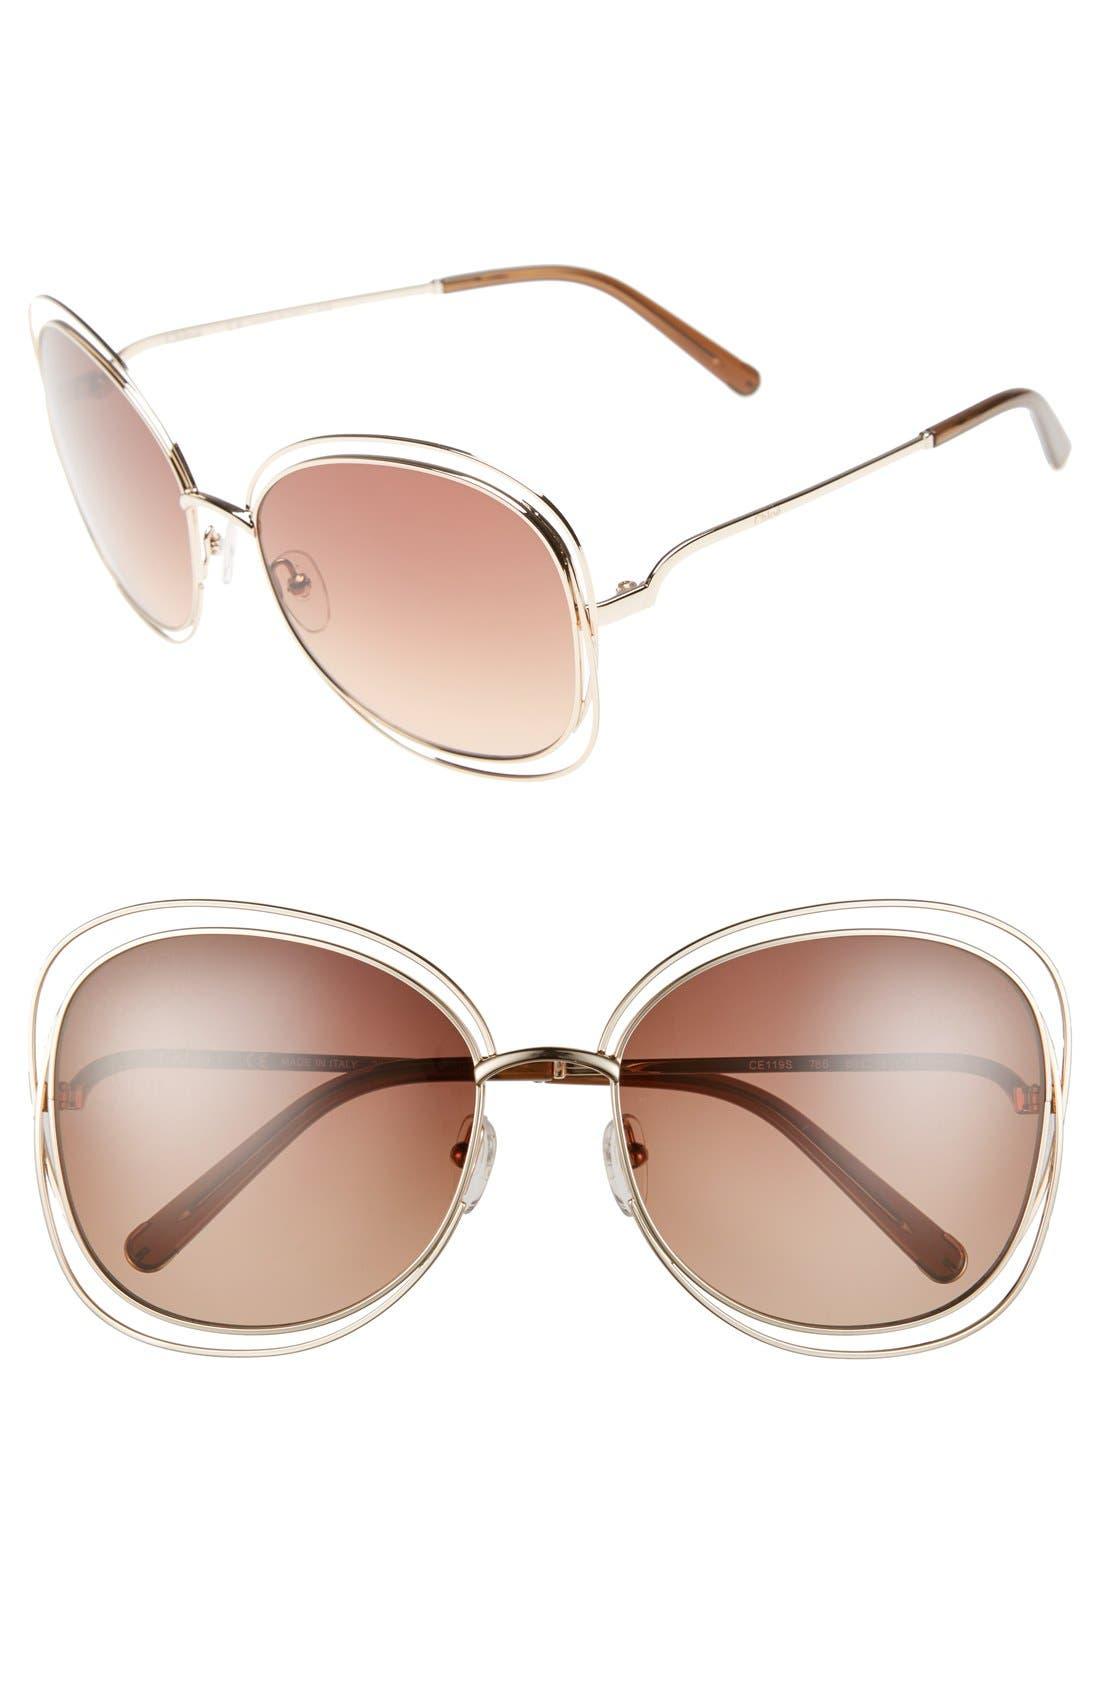 Carlina 60mm Gradient Les Sunglasses,                         Main,                         color, Rose Gold/ Brown